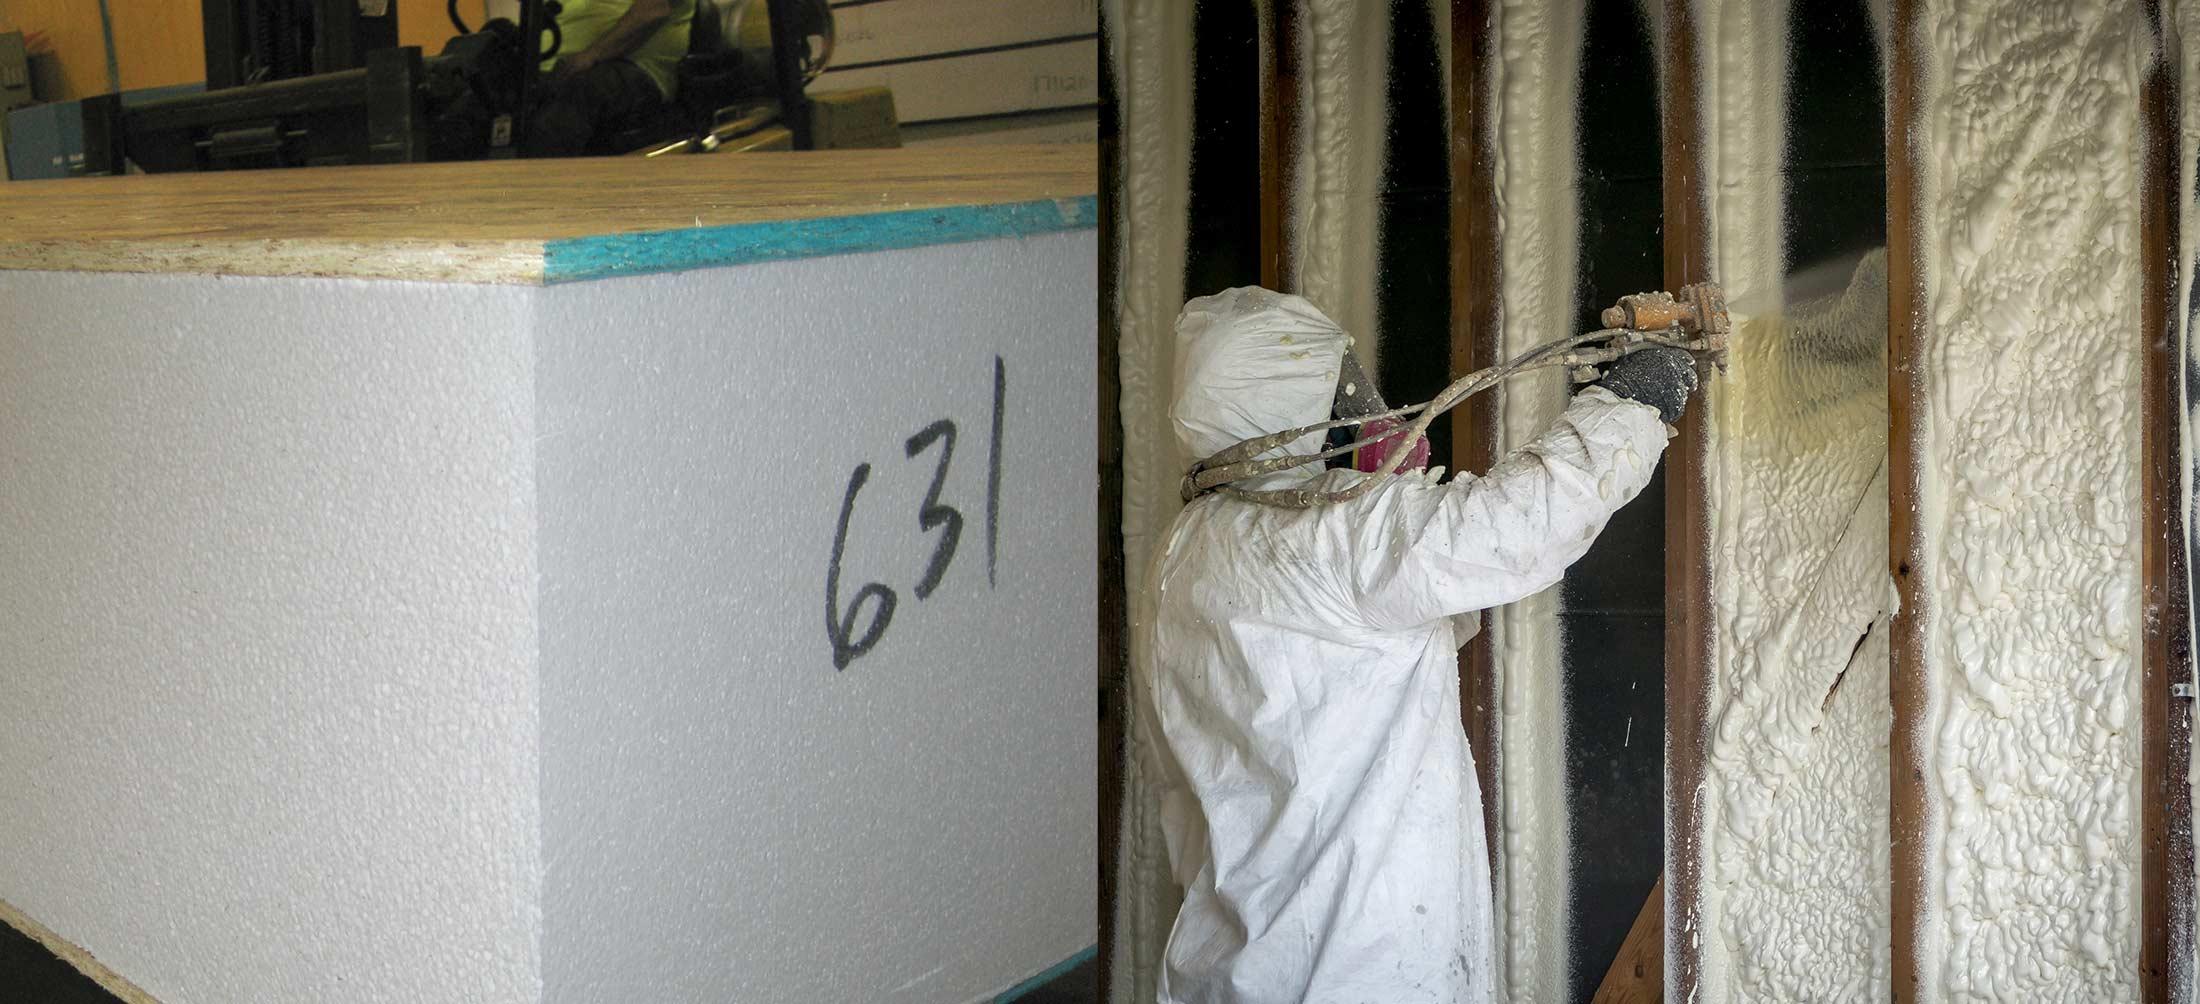 EPS insulation vs PUR